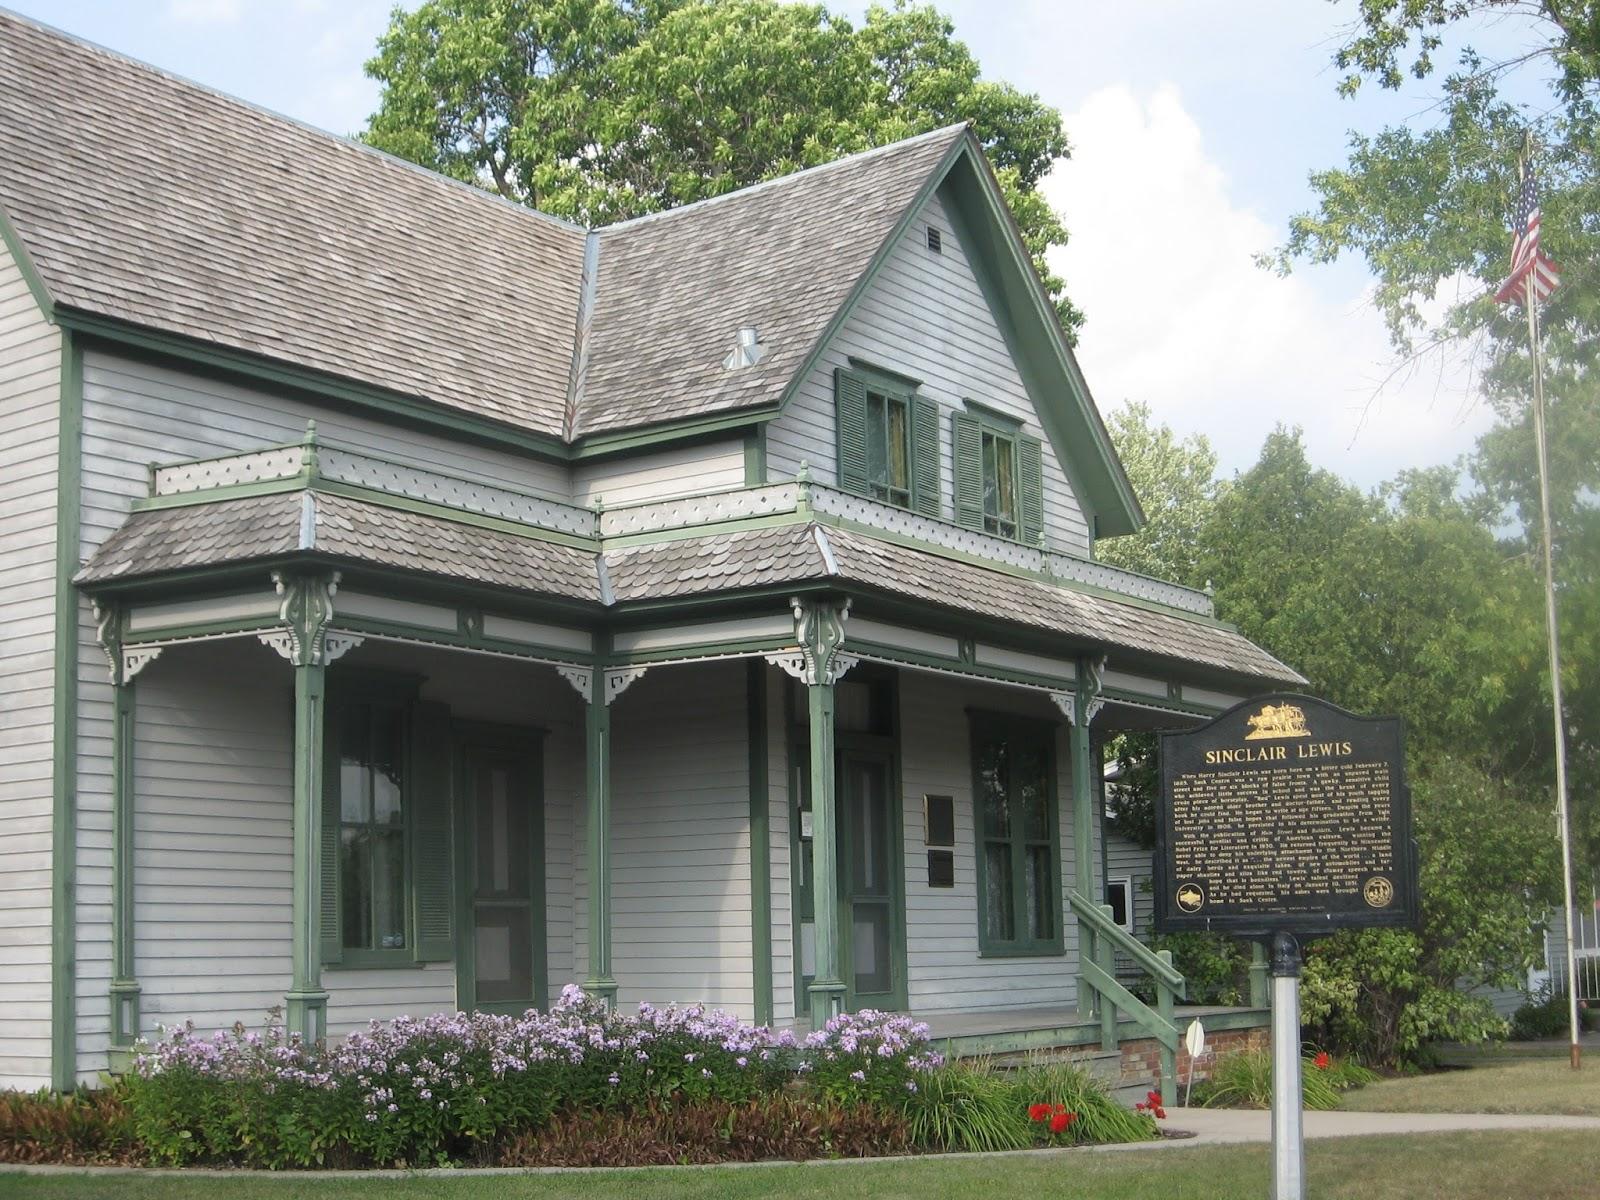 Road Trips Sauk Centre Minnesota Boyhood Home Of